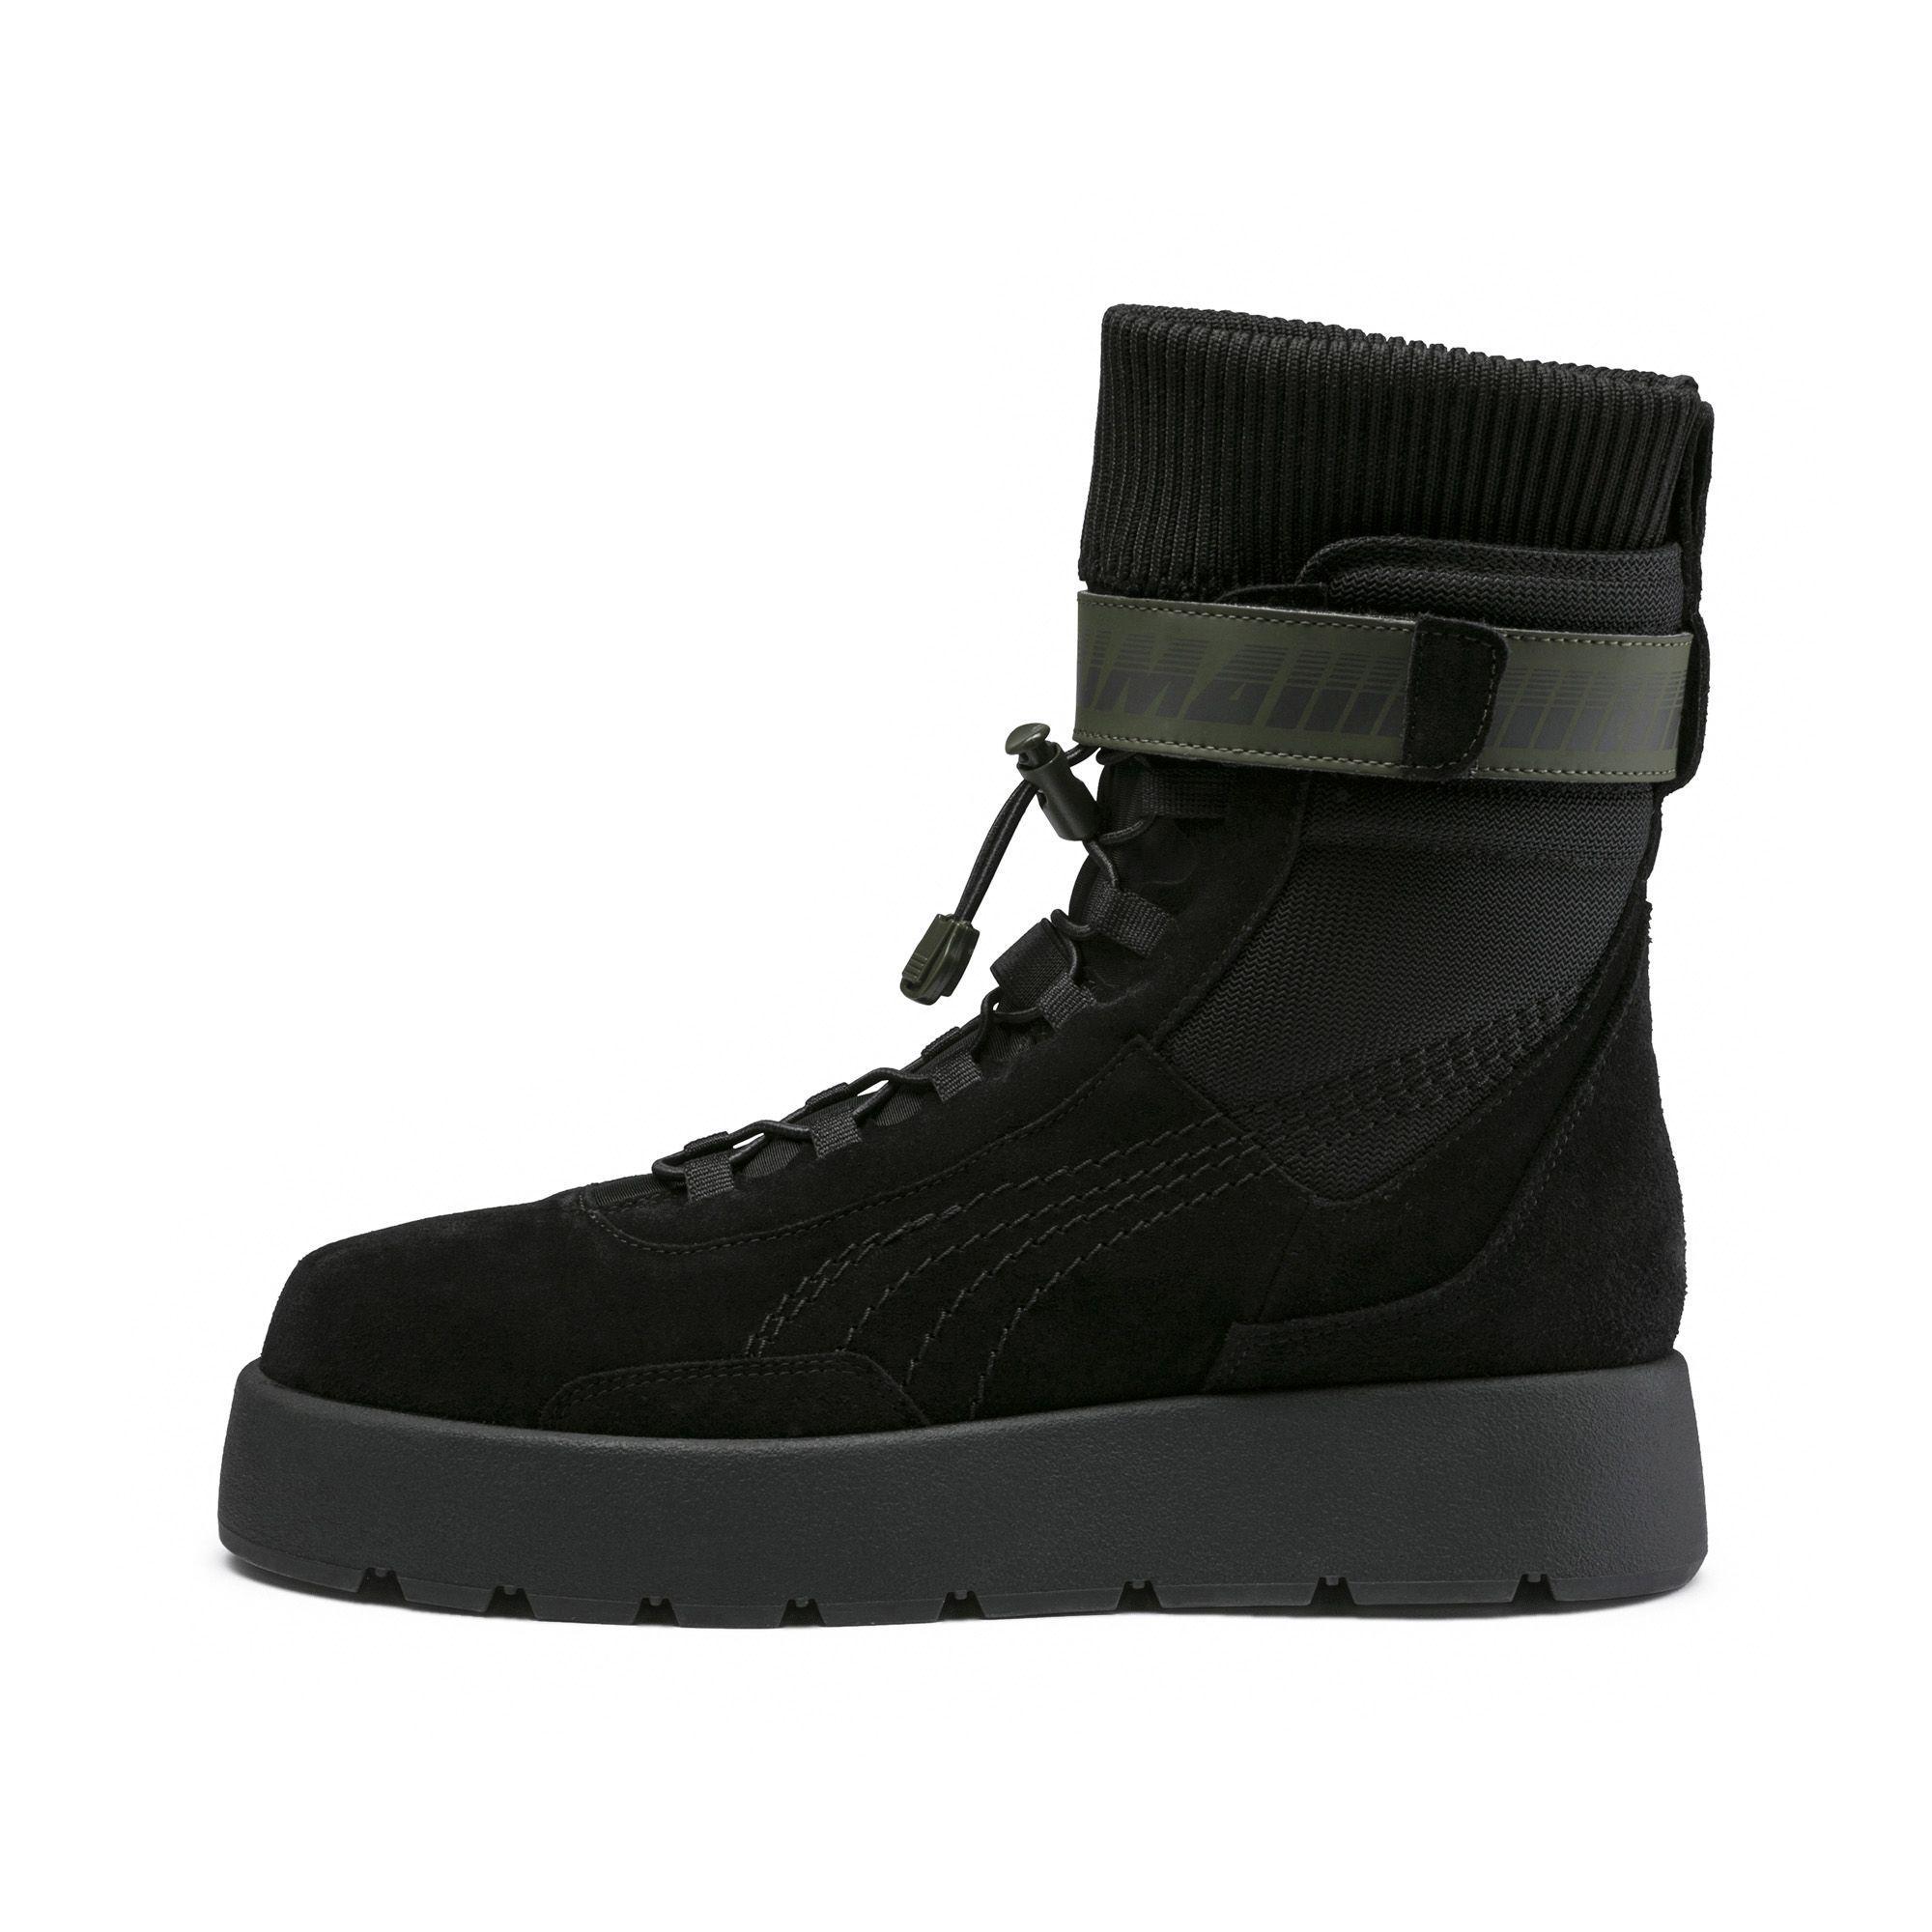 6060d877cfd0 Black Boot Fenty Puma In Women s Scuba Lyst YHawBqw